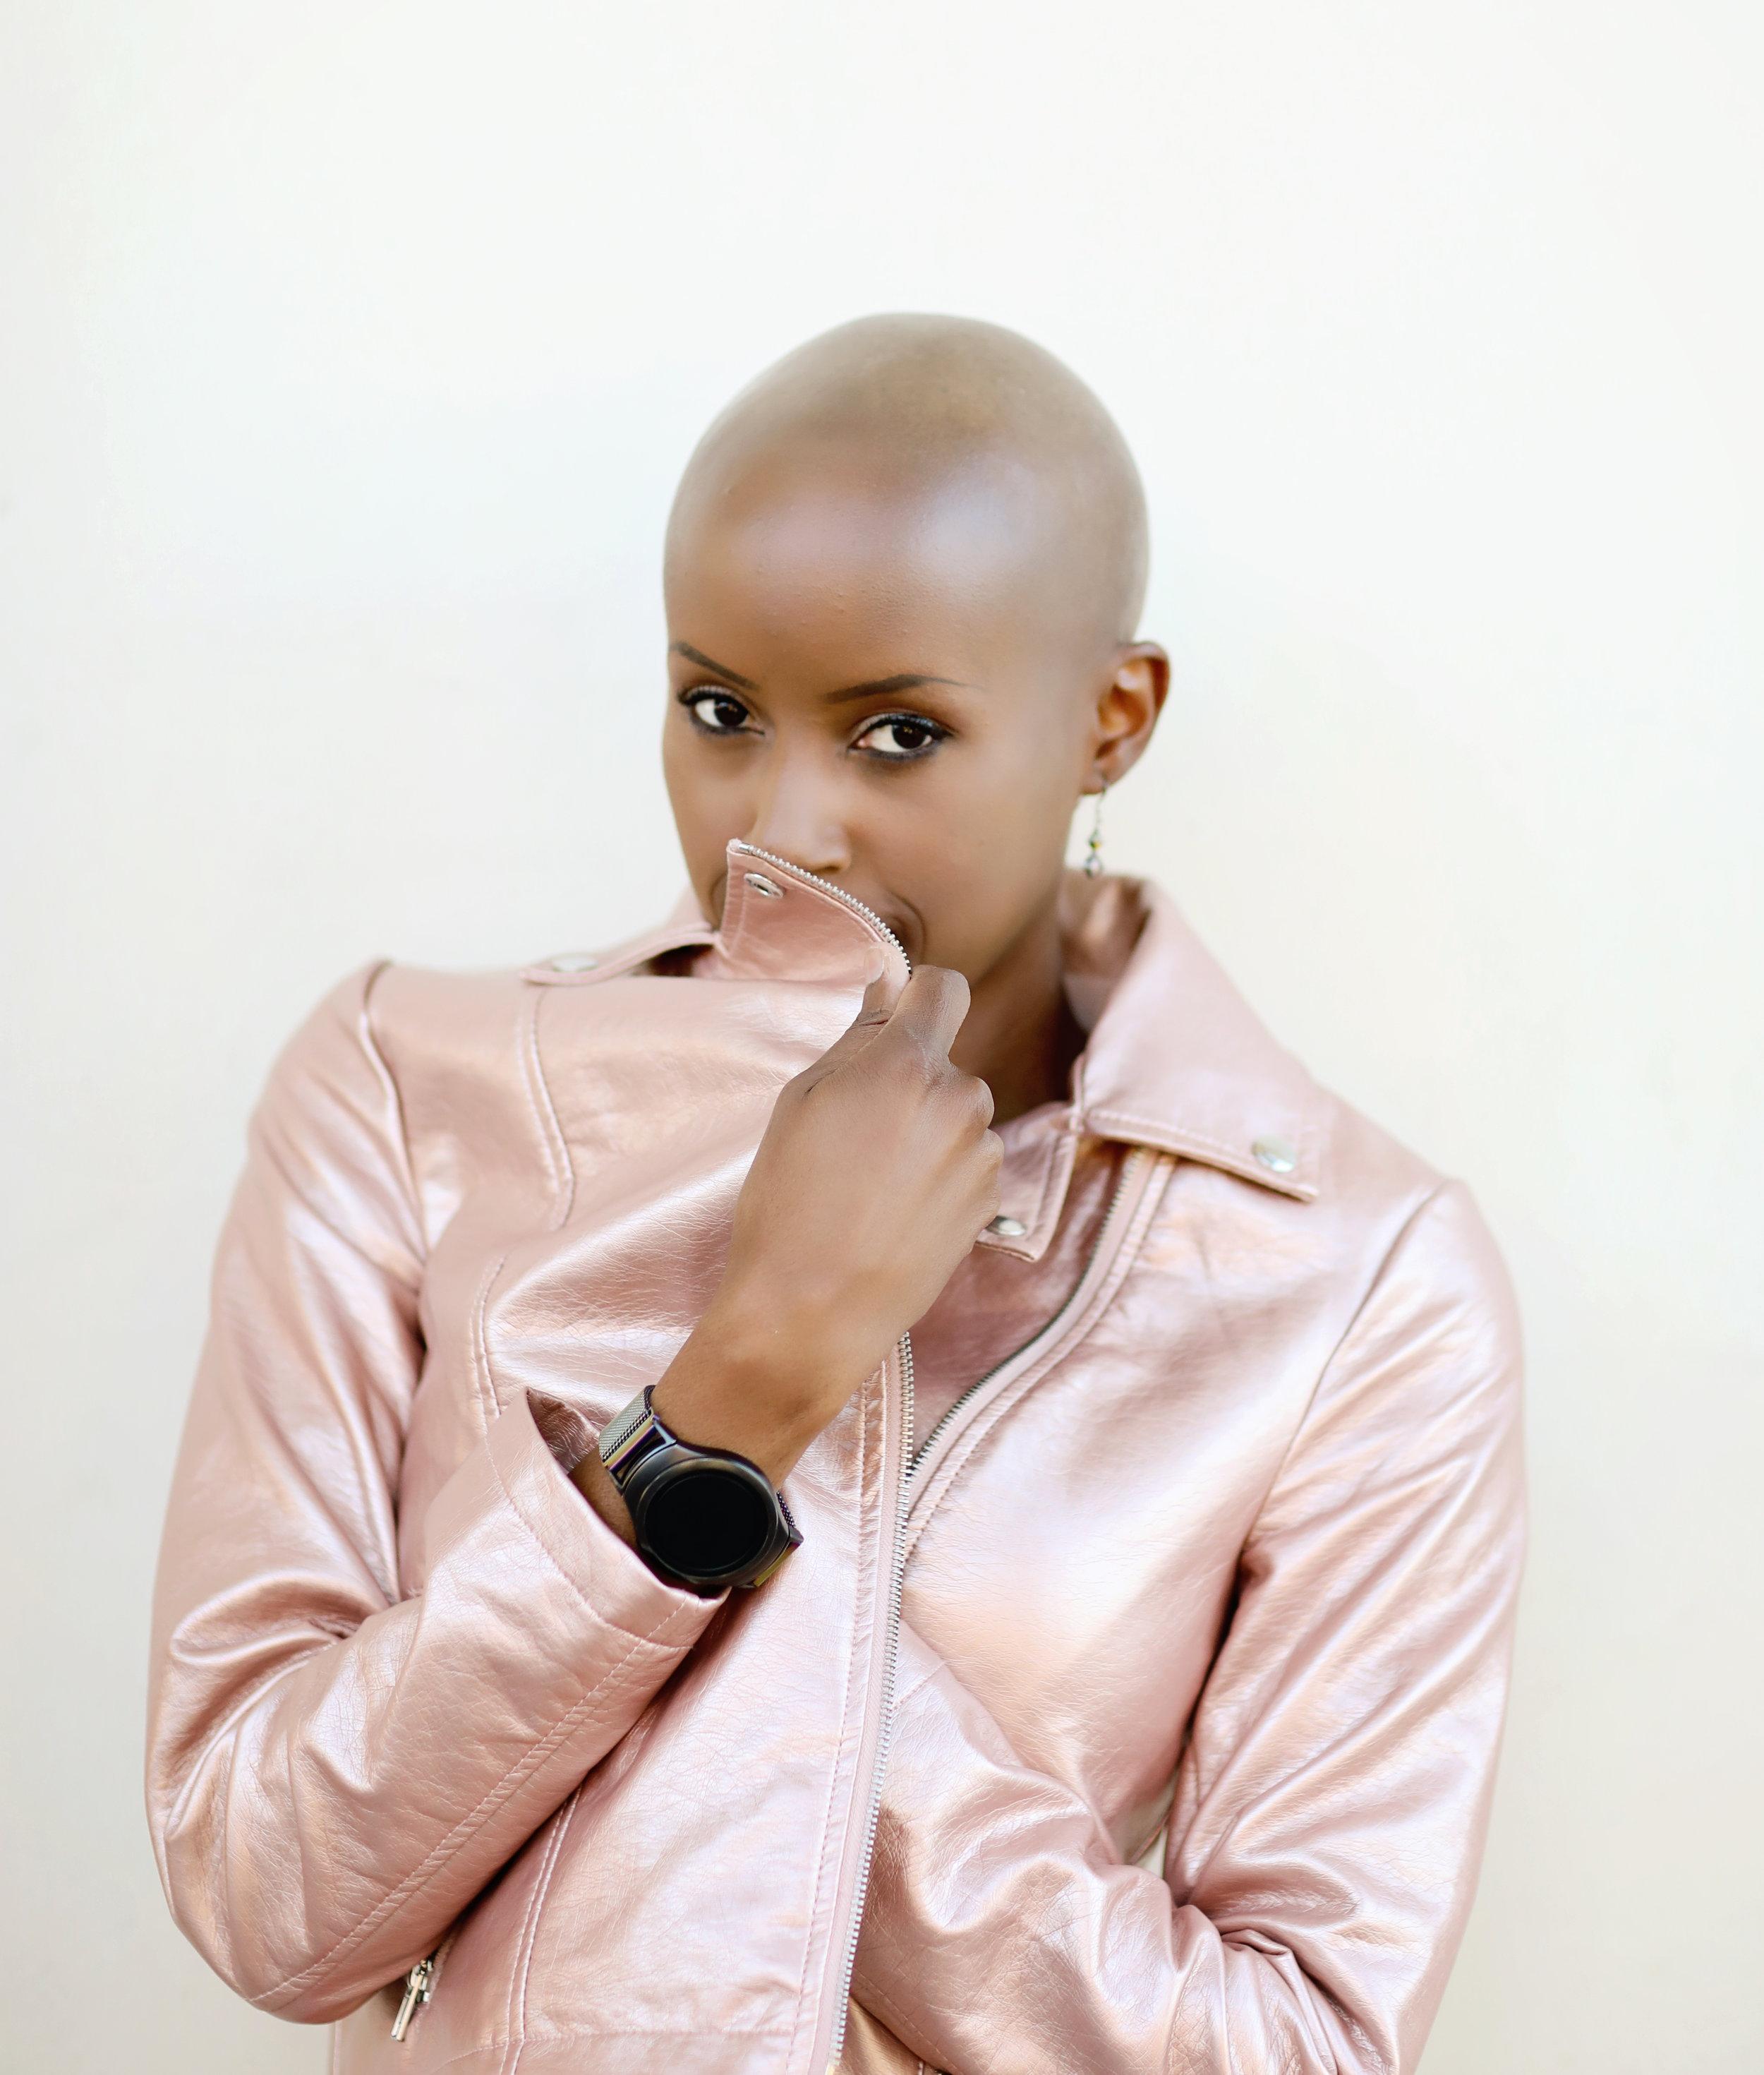 Fashion model wearing pink leather jacket